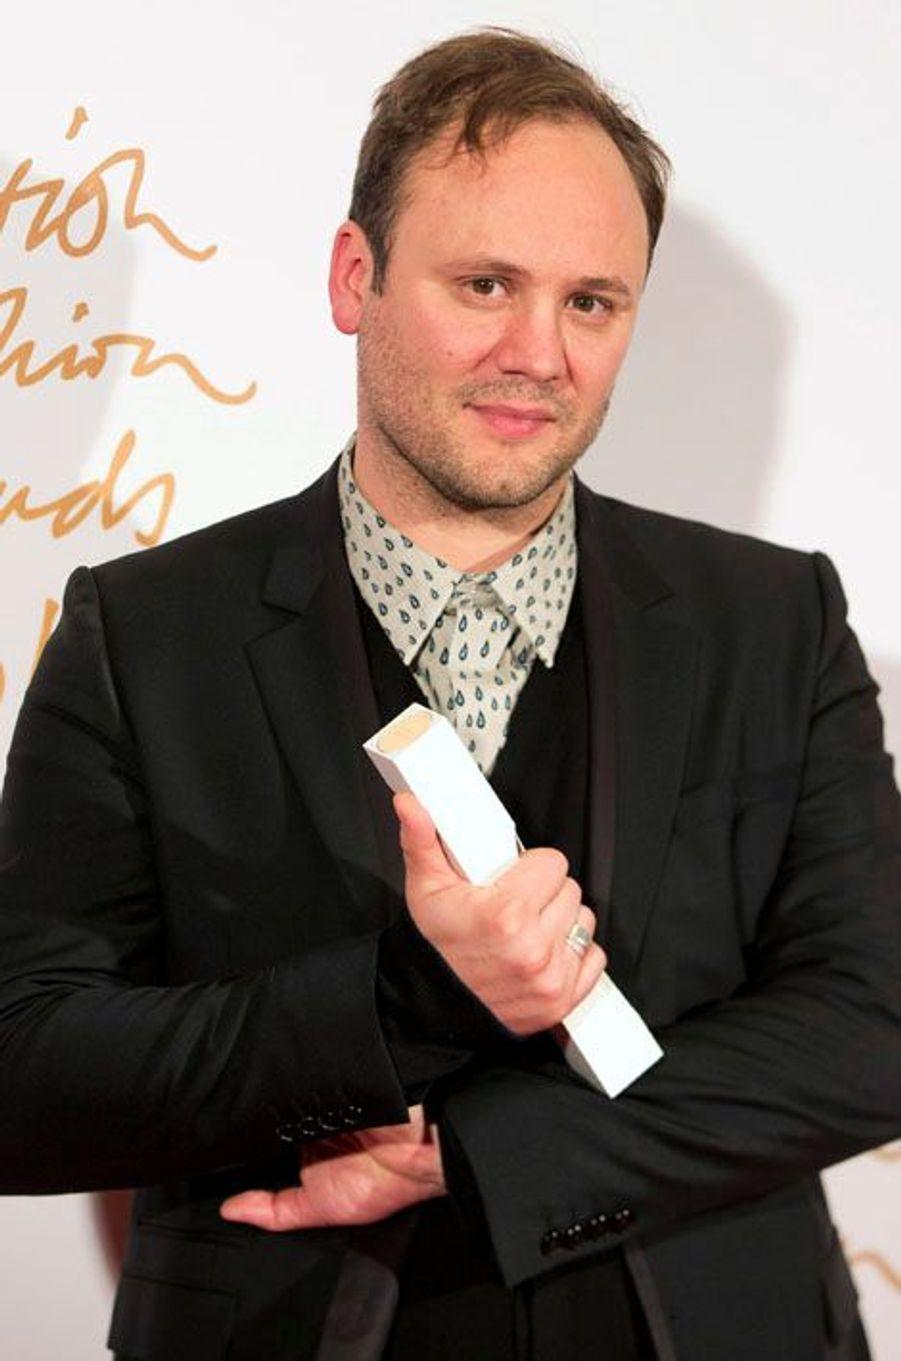 Nicholas Kirkwood, Accessories designer of the Year